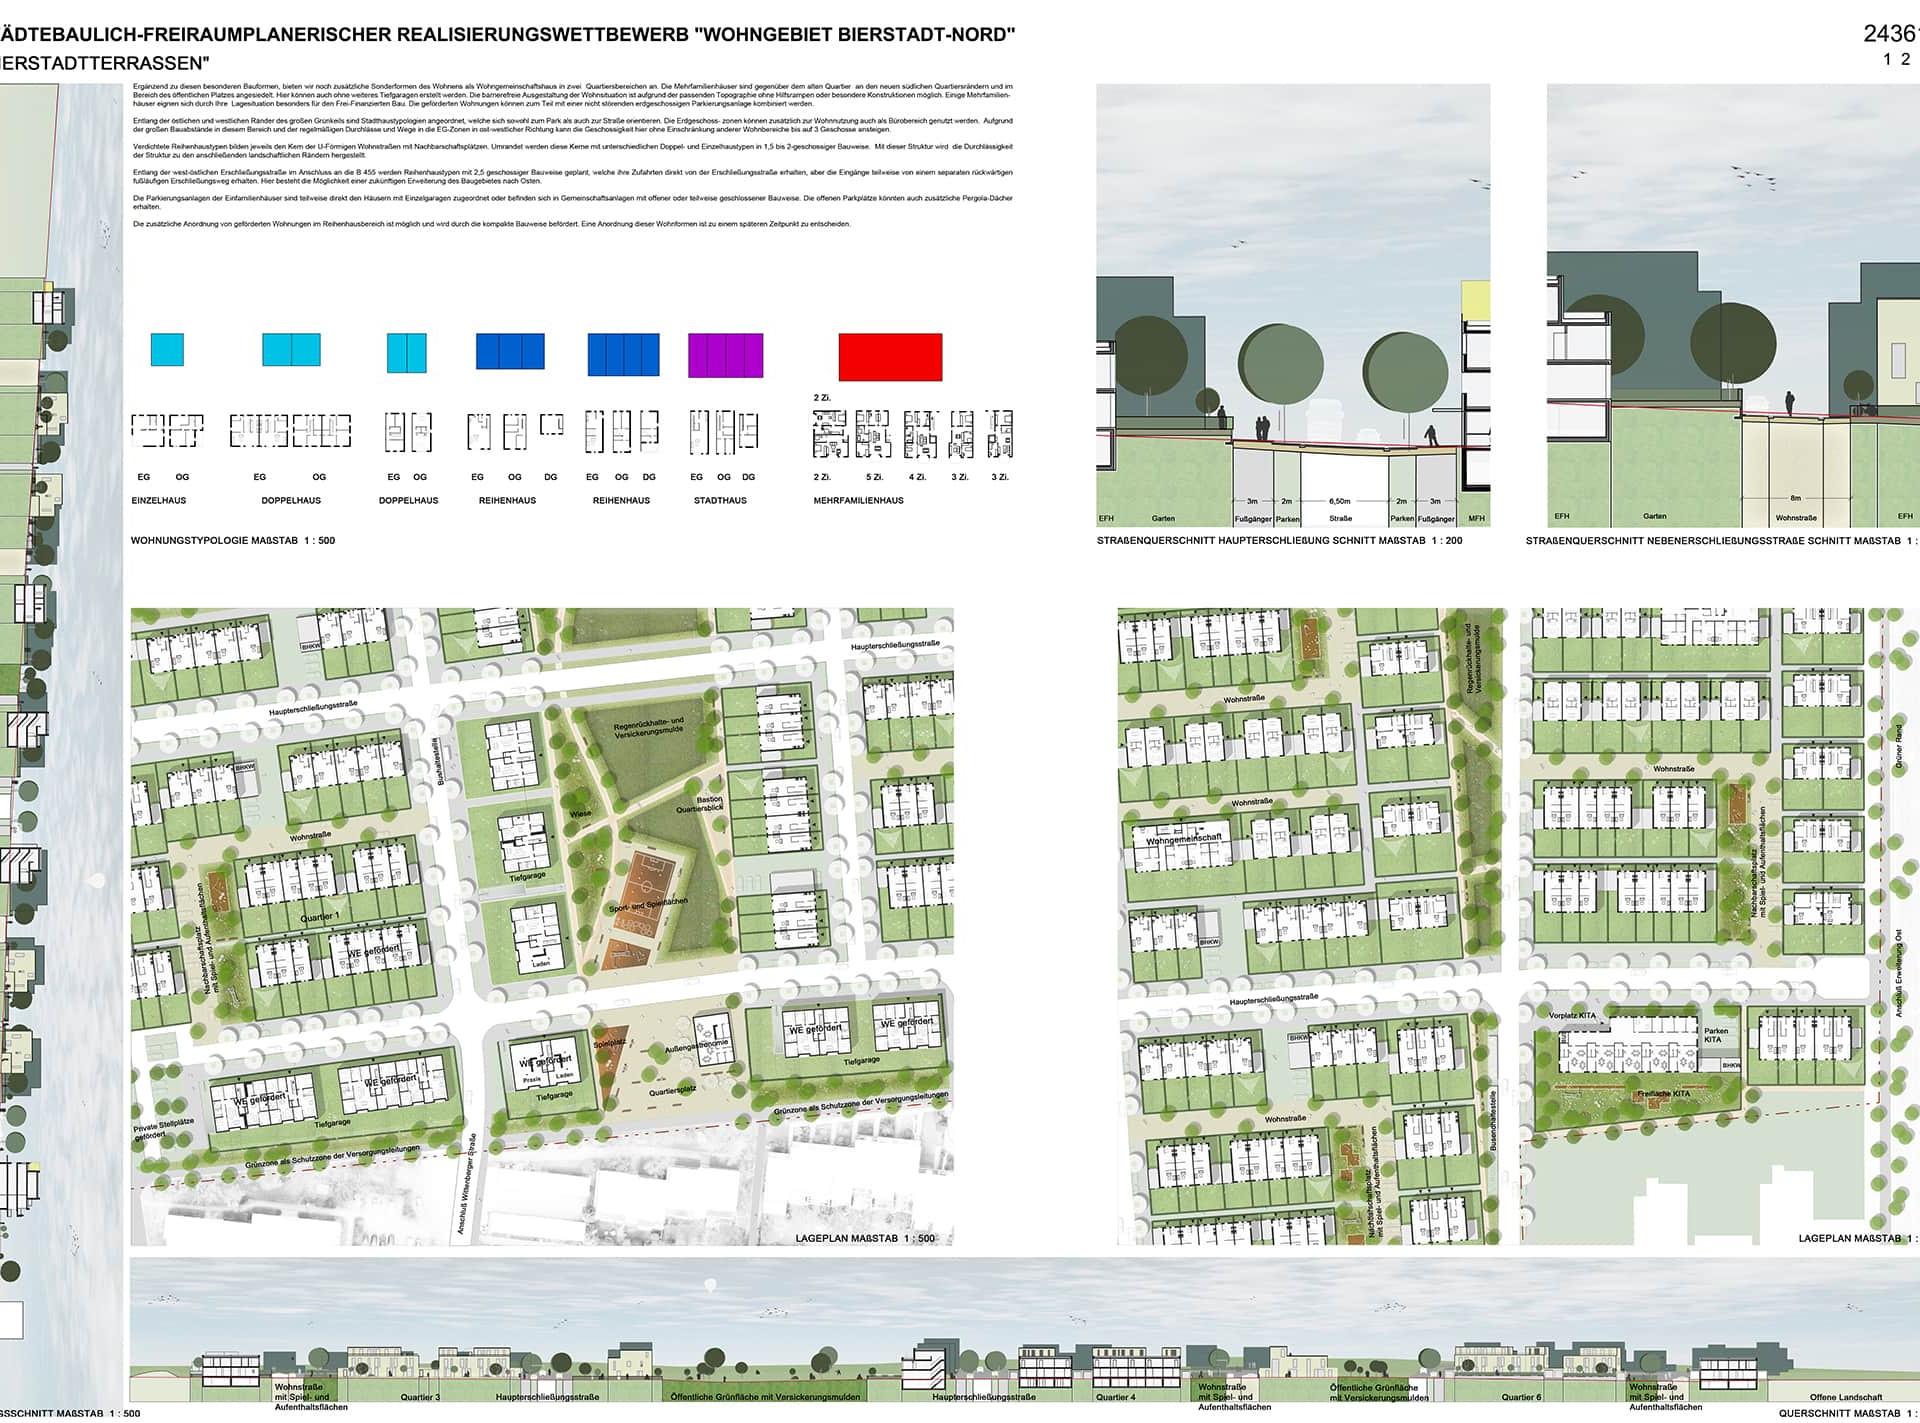 243619_Wiesbaden_Plan_3.jpg